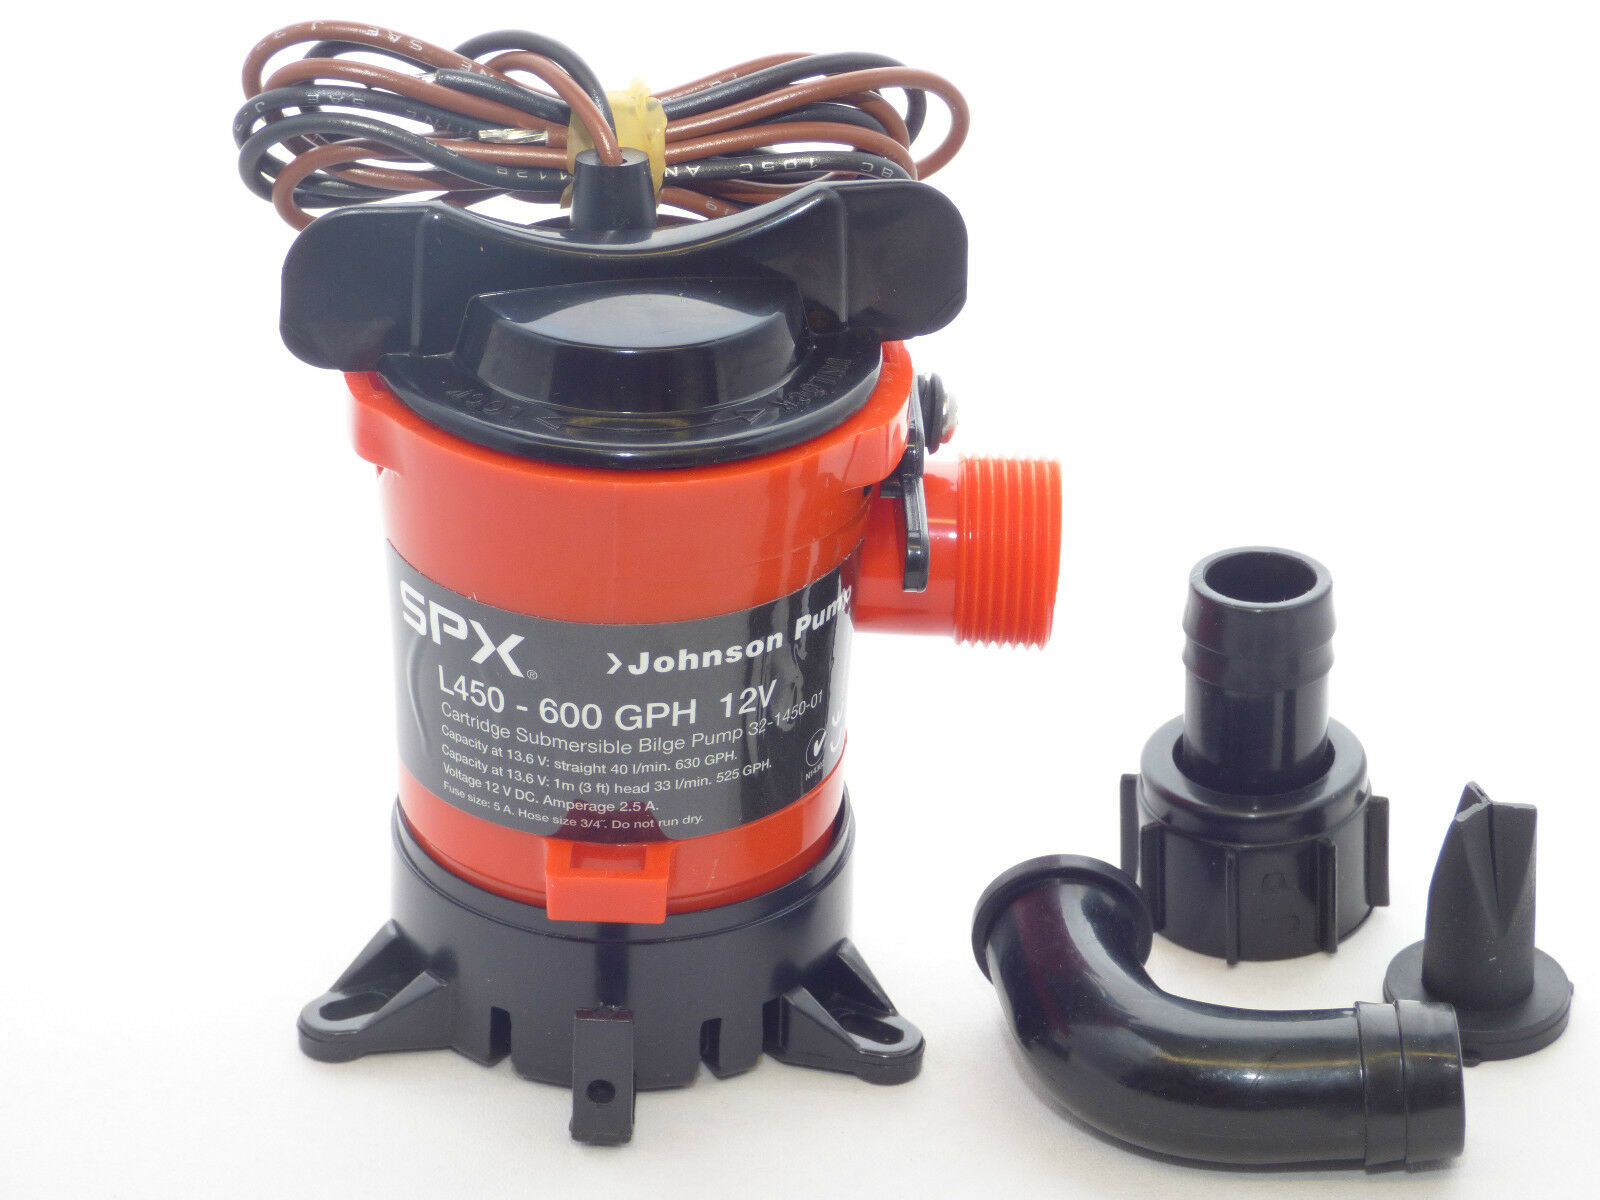 Bilge Pump Johnson PUMP L450 - L 750 Bilge Pump Water Pump Submersible Pump